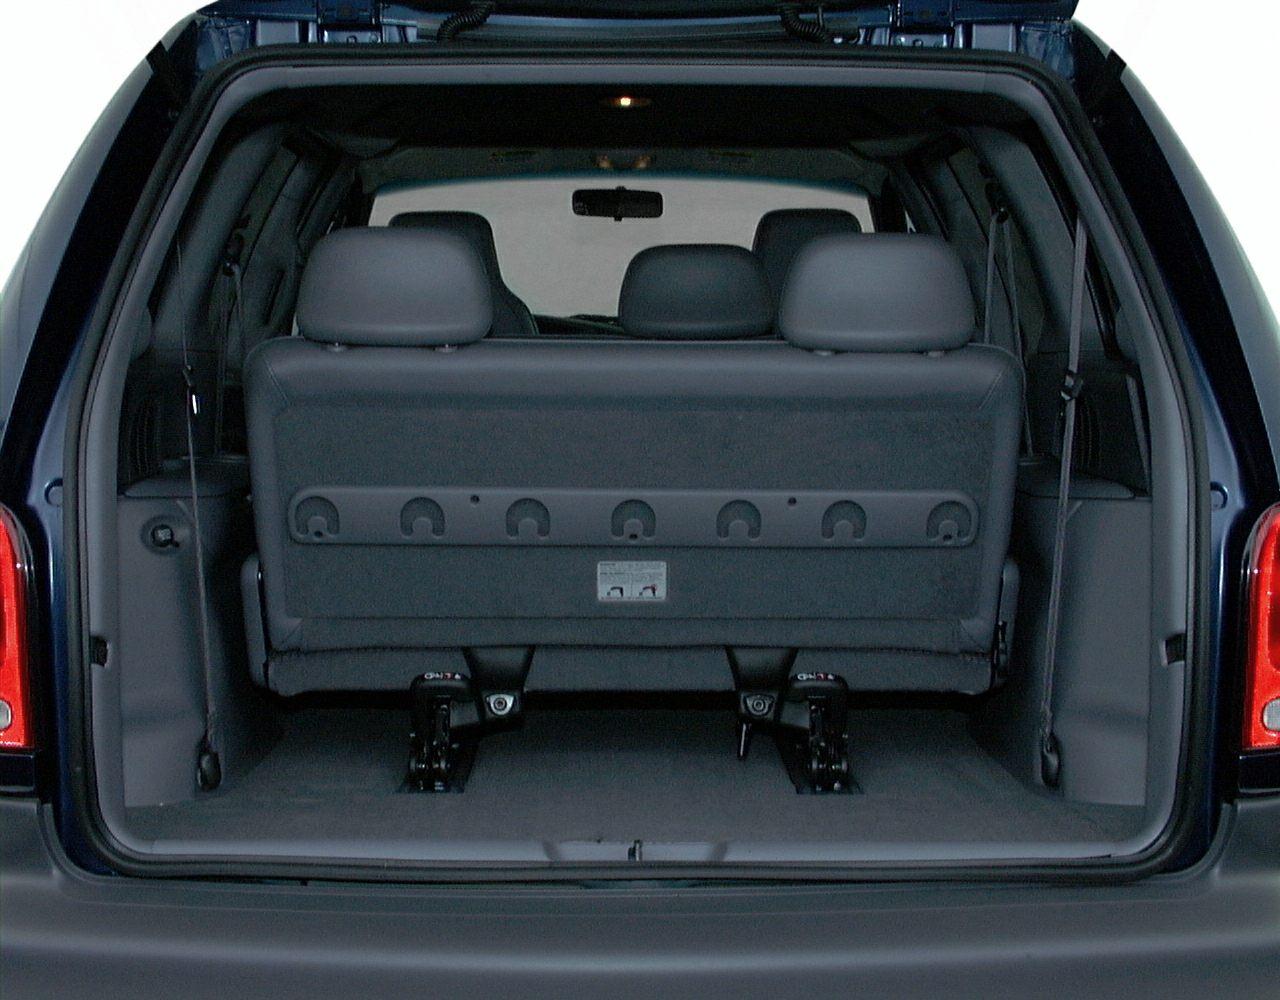 2000 Dodge Grand Caravan Exterior Photo